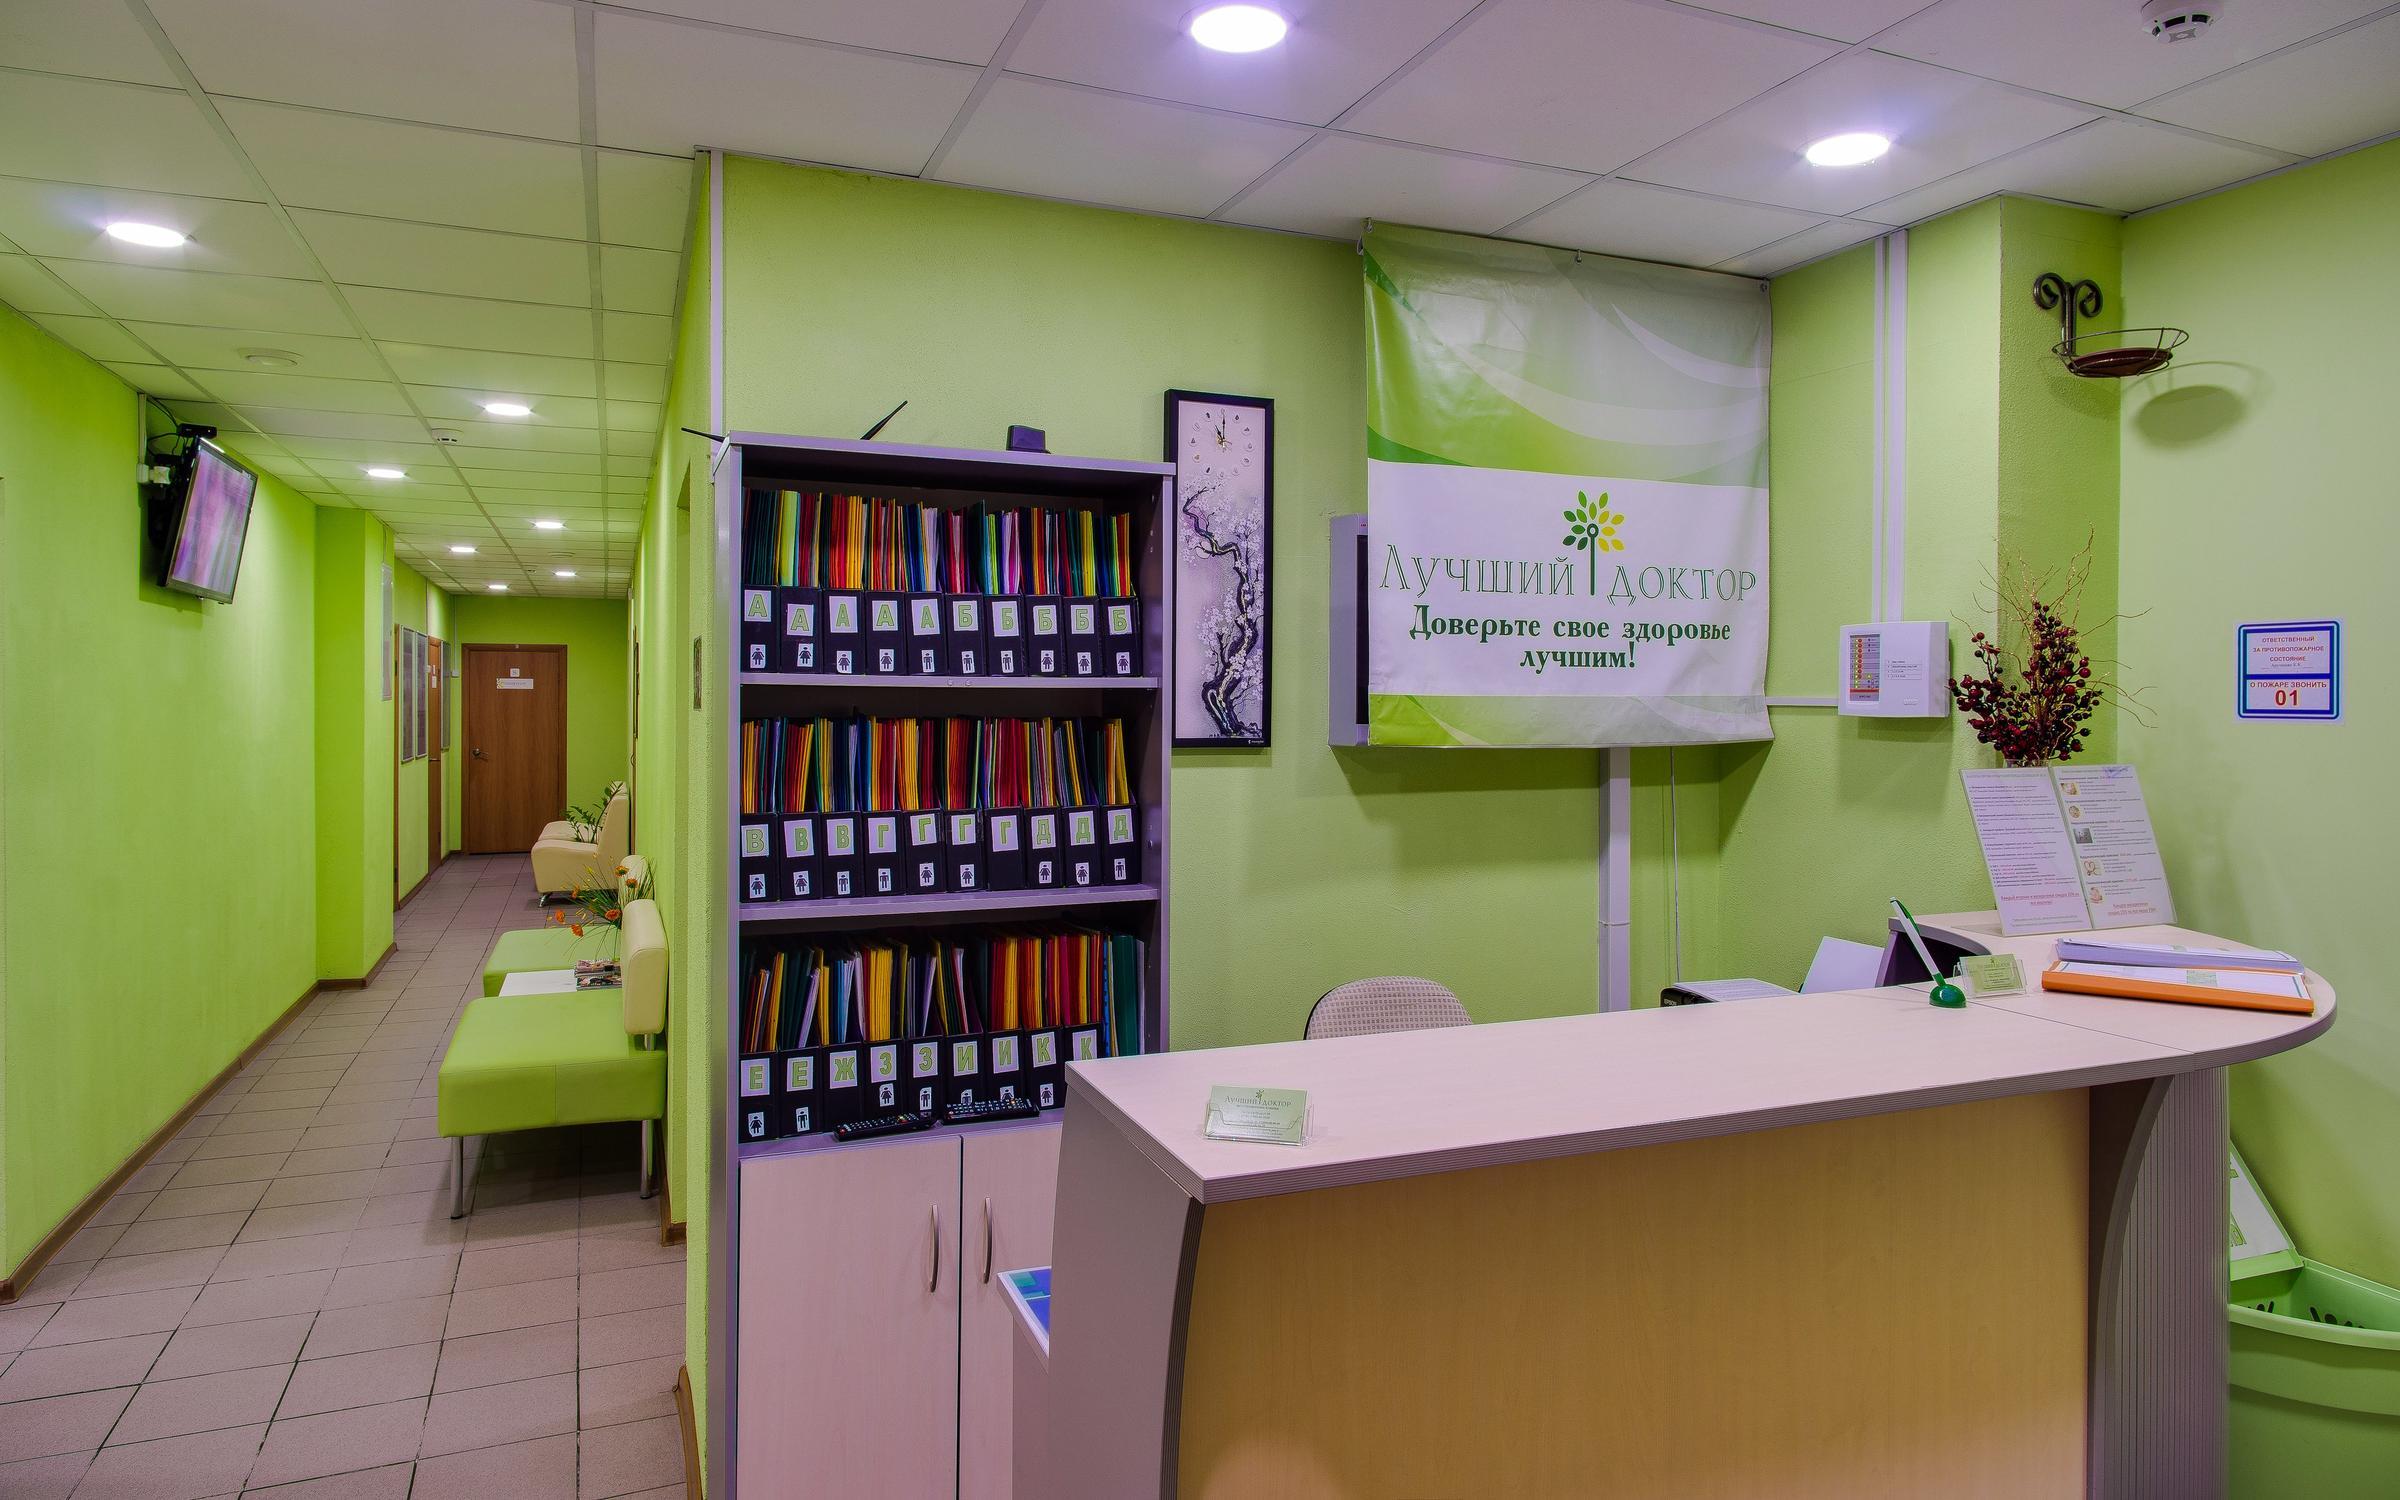 фотография Медицинского центра ЛД Клиника в Свиблово